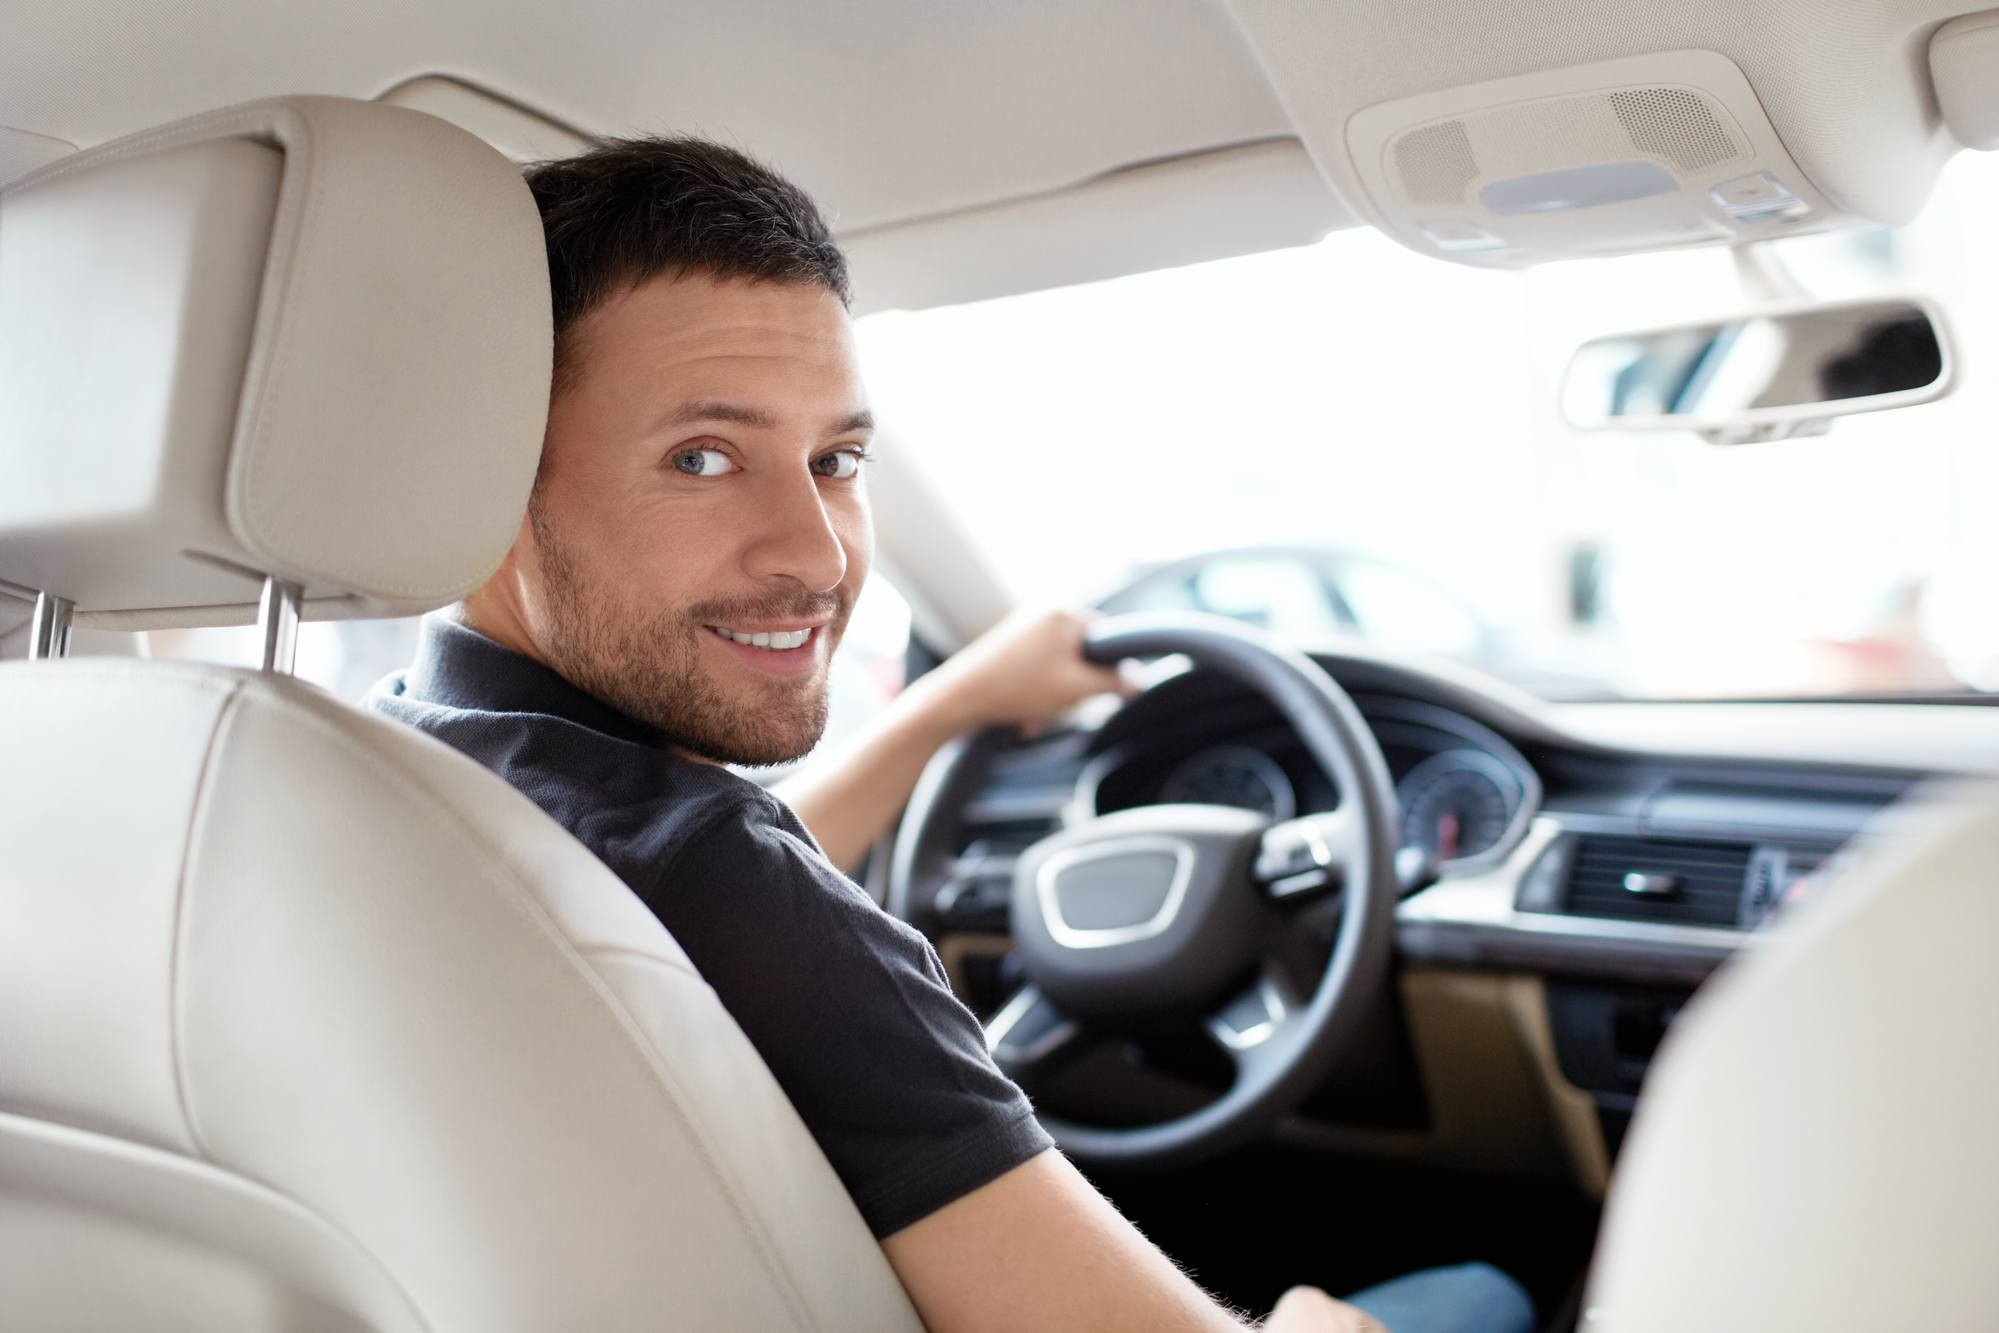 Hvordan får man råd til en bil som studerende?